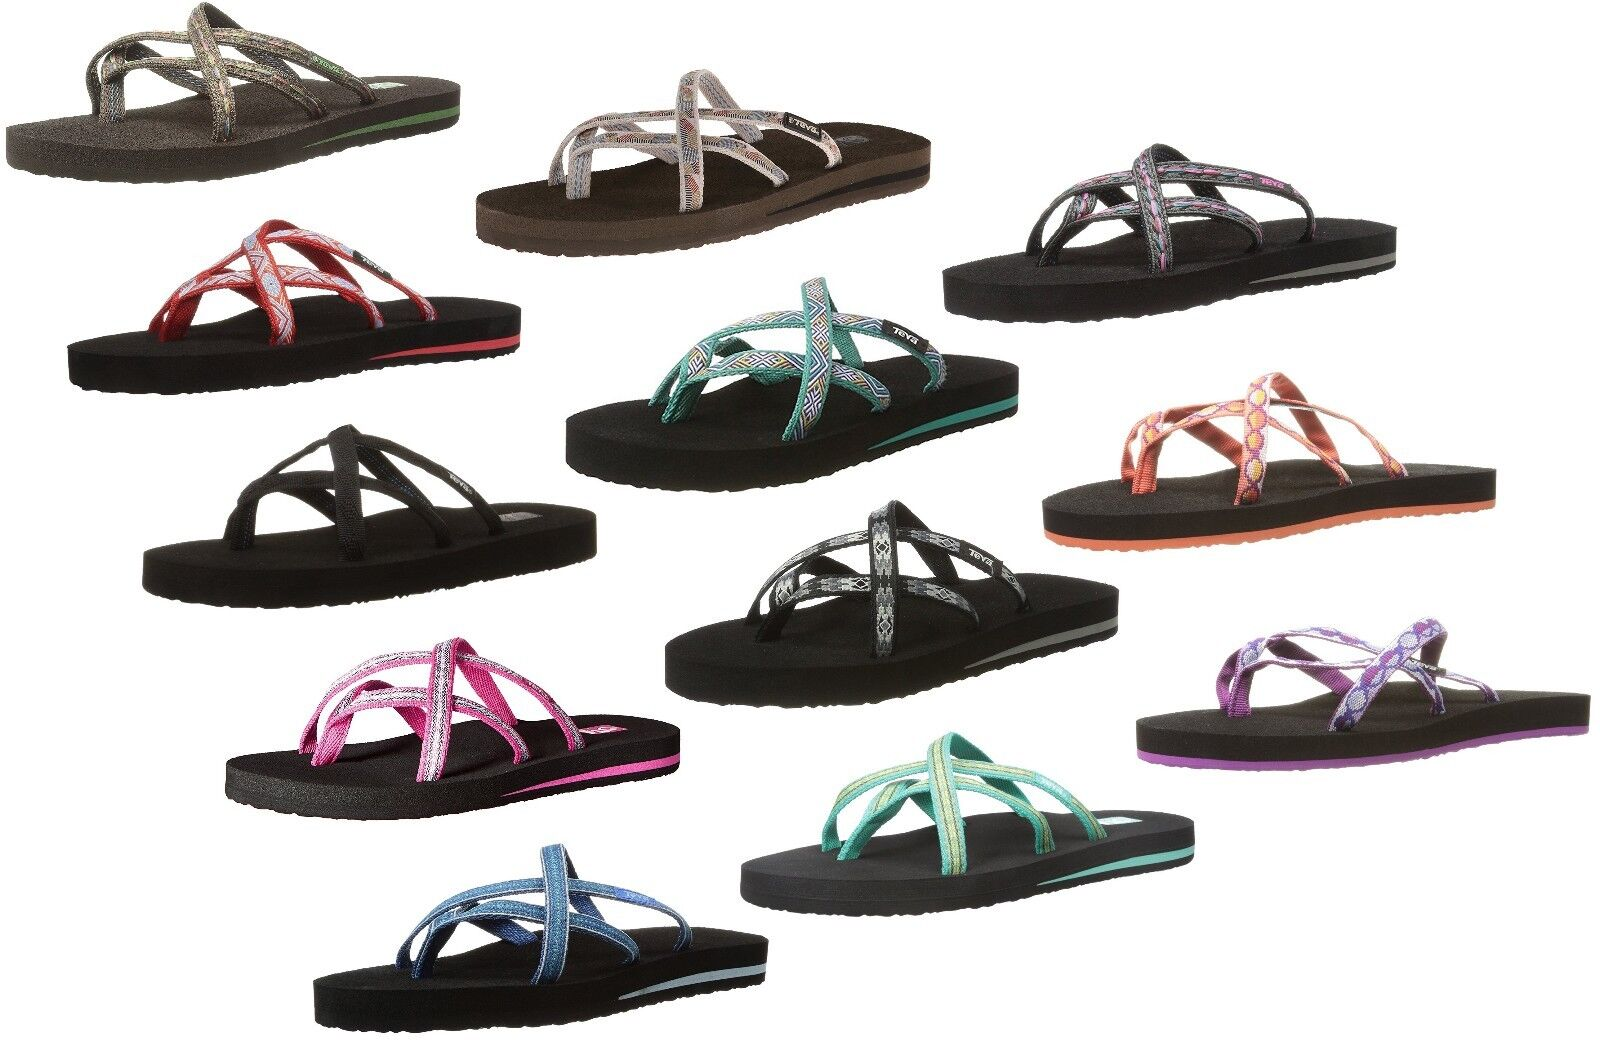 055a240615ae92 Teva 6840 Fblck Olowahu Felicitas Black Women s Sandals 10 US for ...